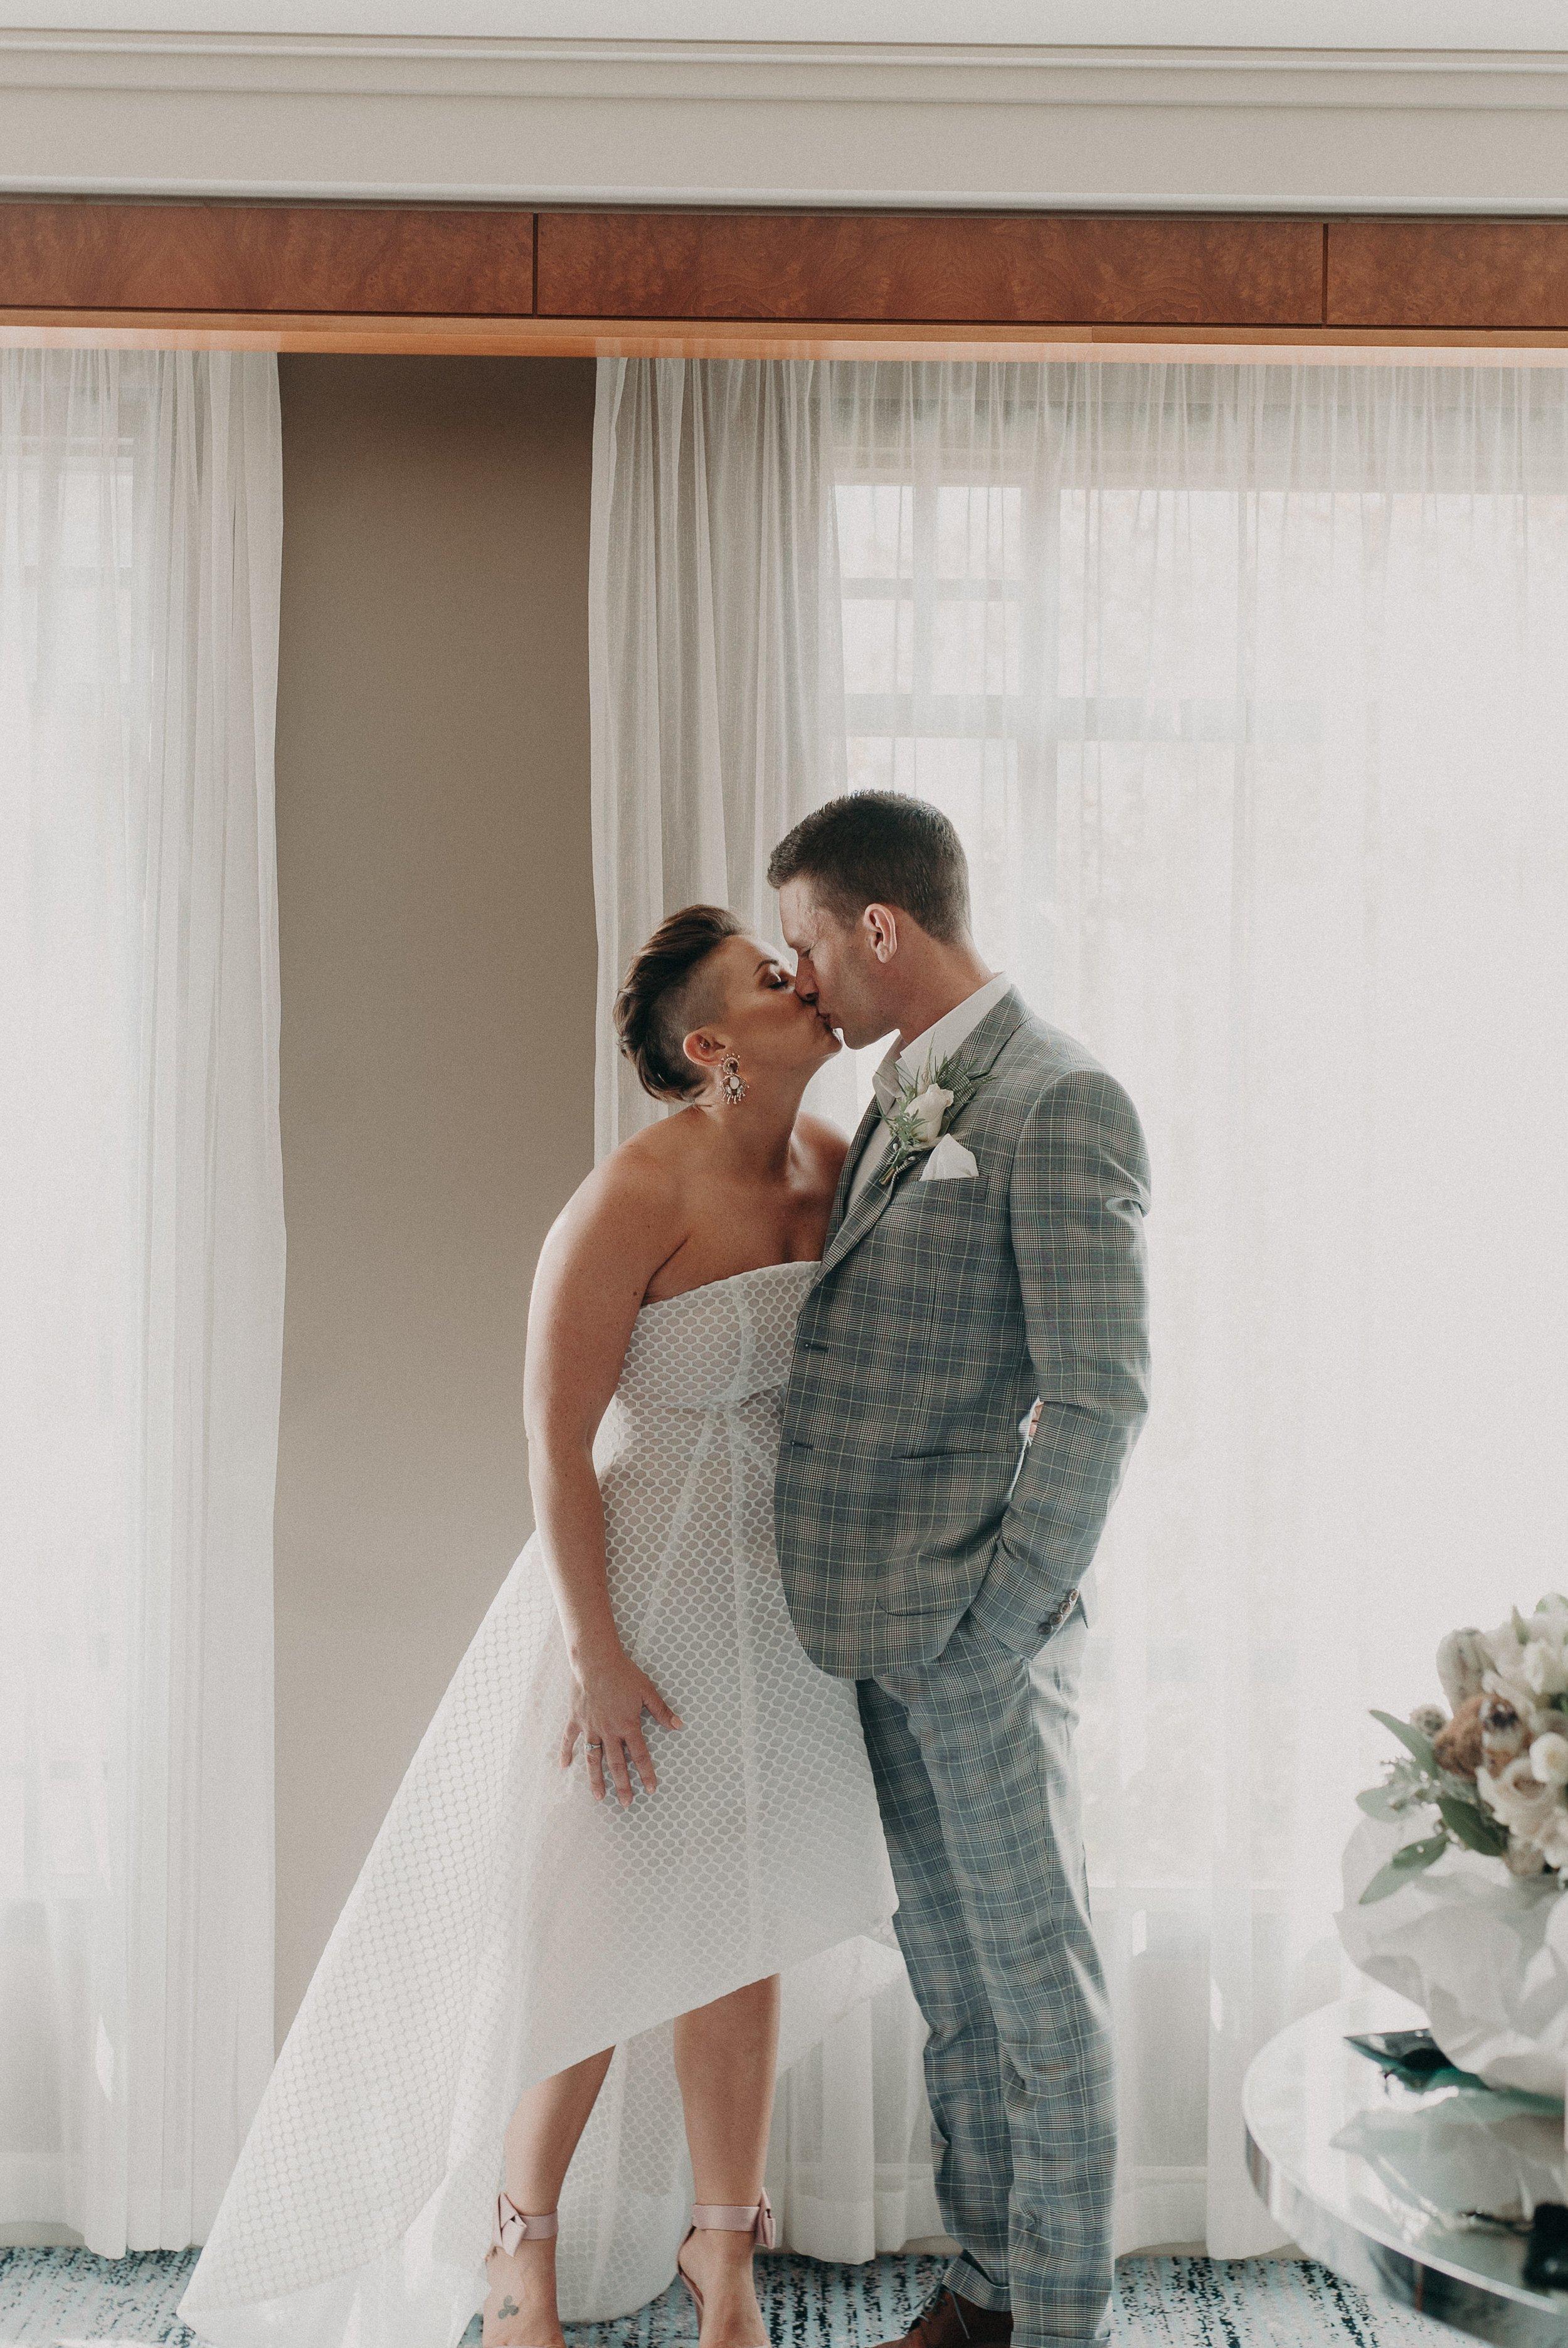 mickalathomas_puremacphotography_weddingphotographer_couplephotographer_Sheppartonphotographer_1527.jpg